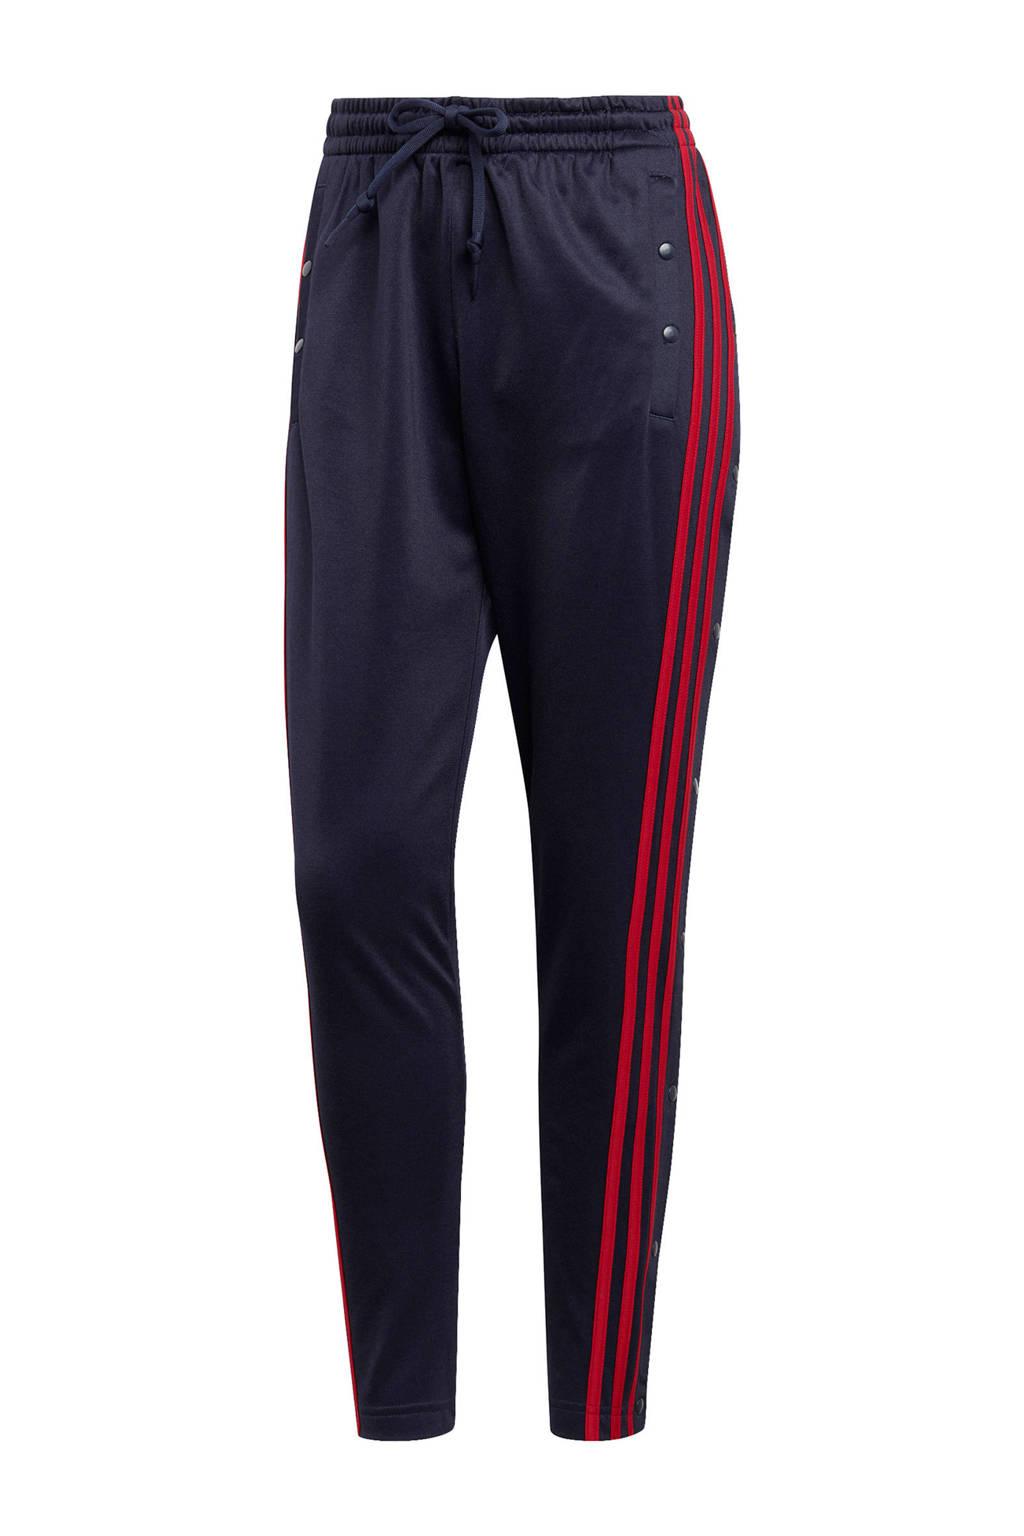 adidas performance sportbroek donkerblauw/rood, Donkerblauw/rood